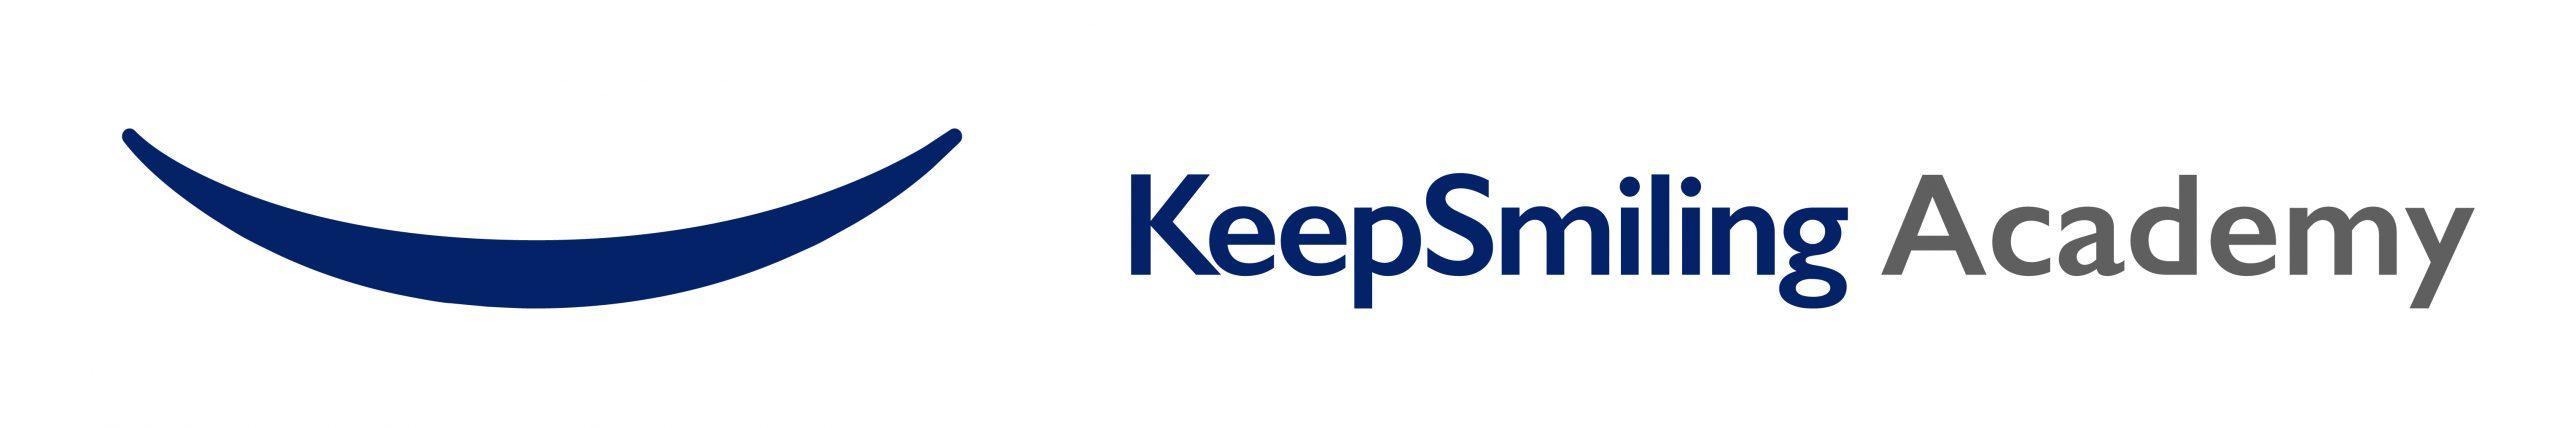 Keepsmiling Academy